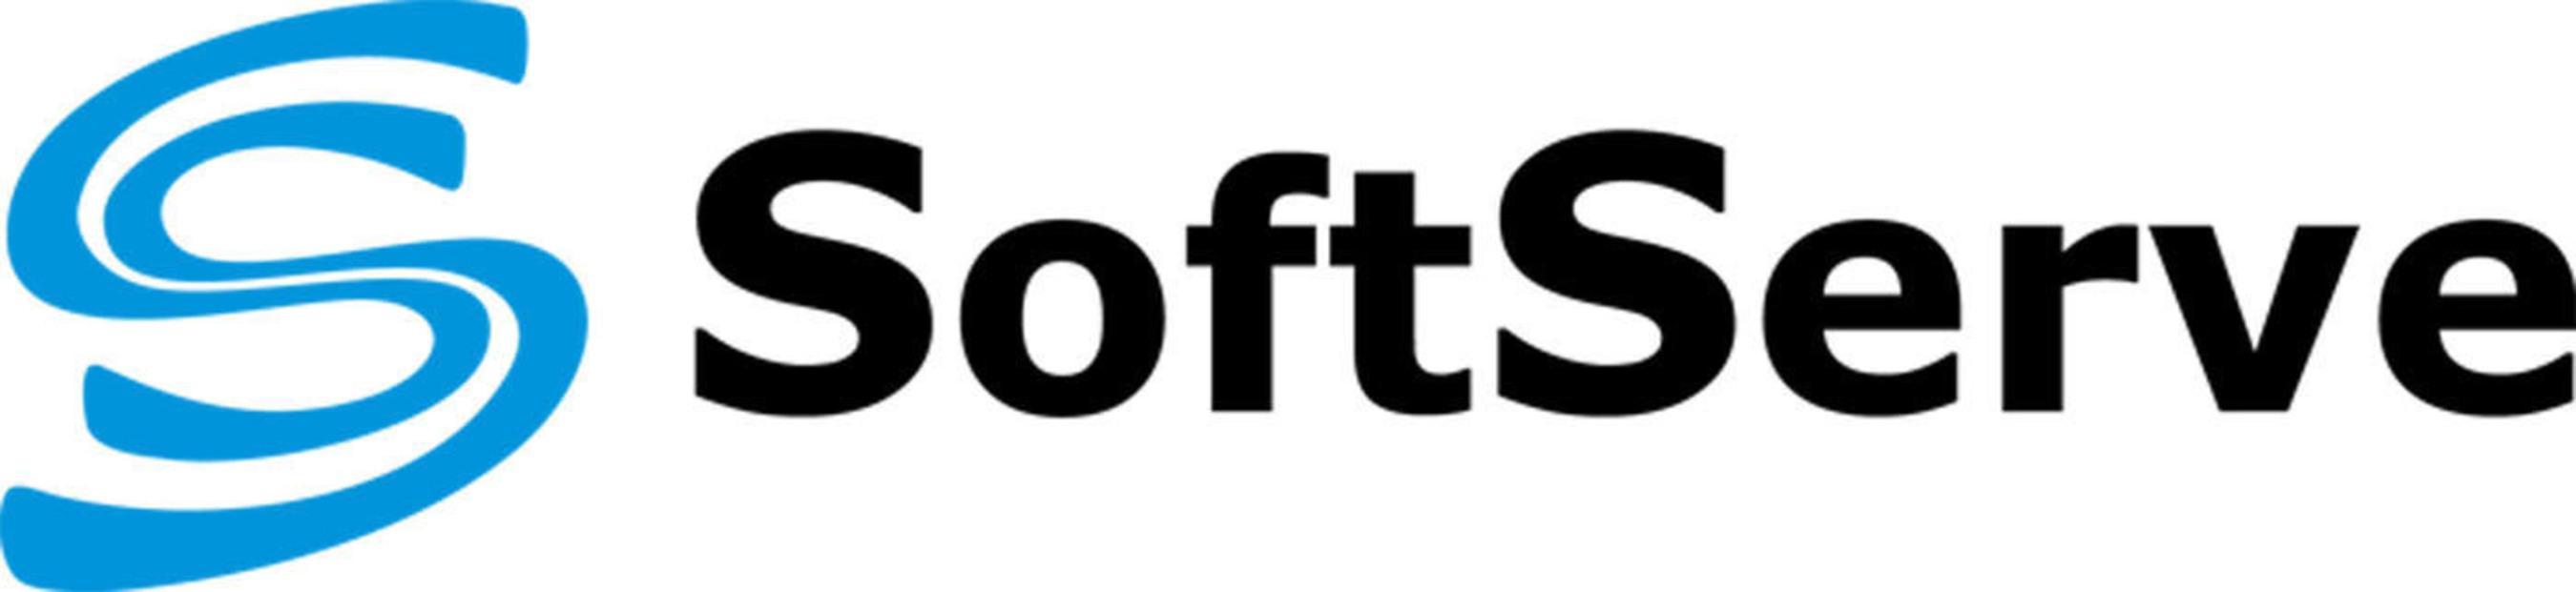 SoftServe logo.